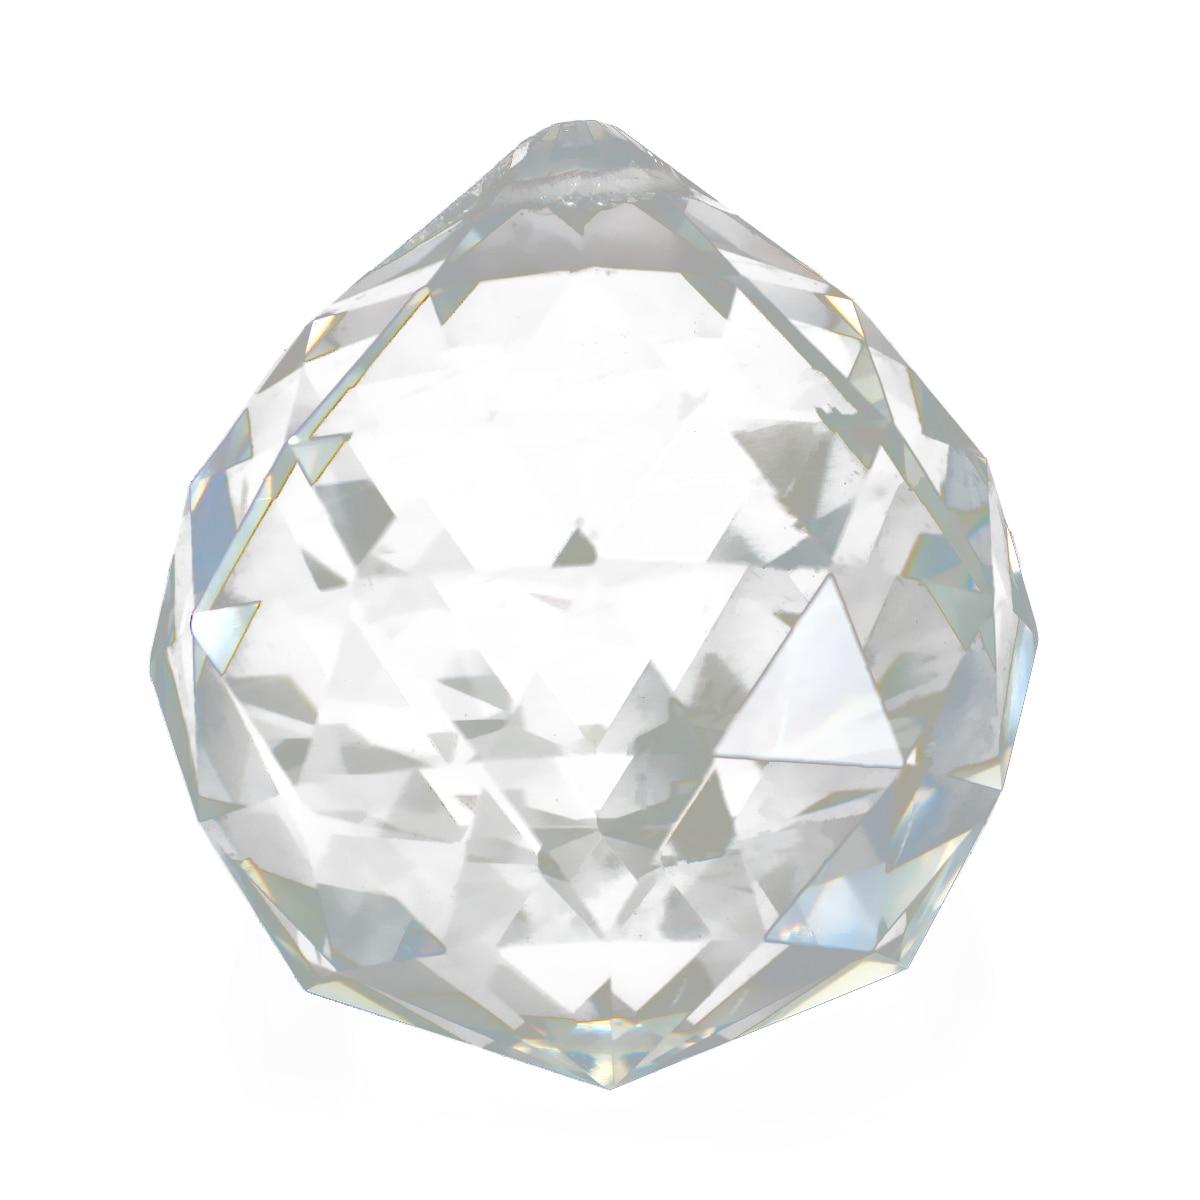 Popular Bulk Chandelier CrystalsBuy Cheap Bulk Chandelier – Chandelier Crystals Bulk